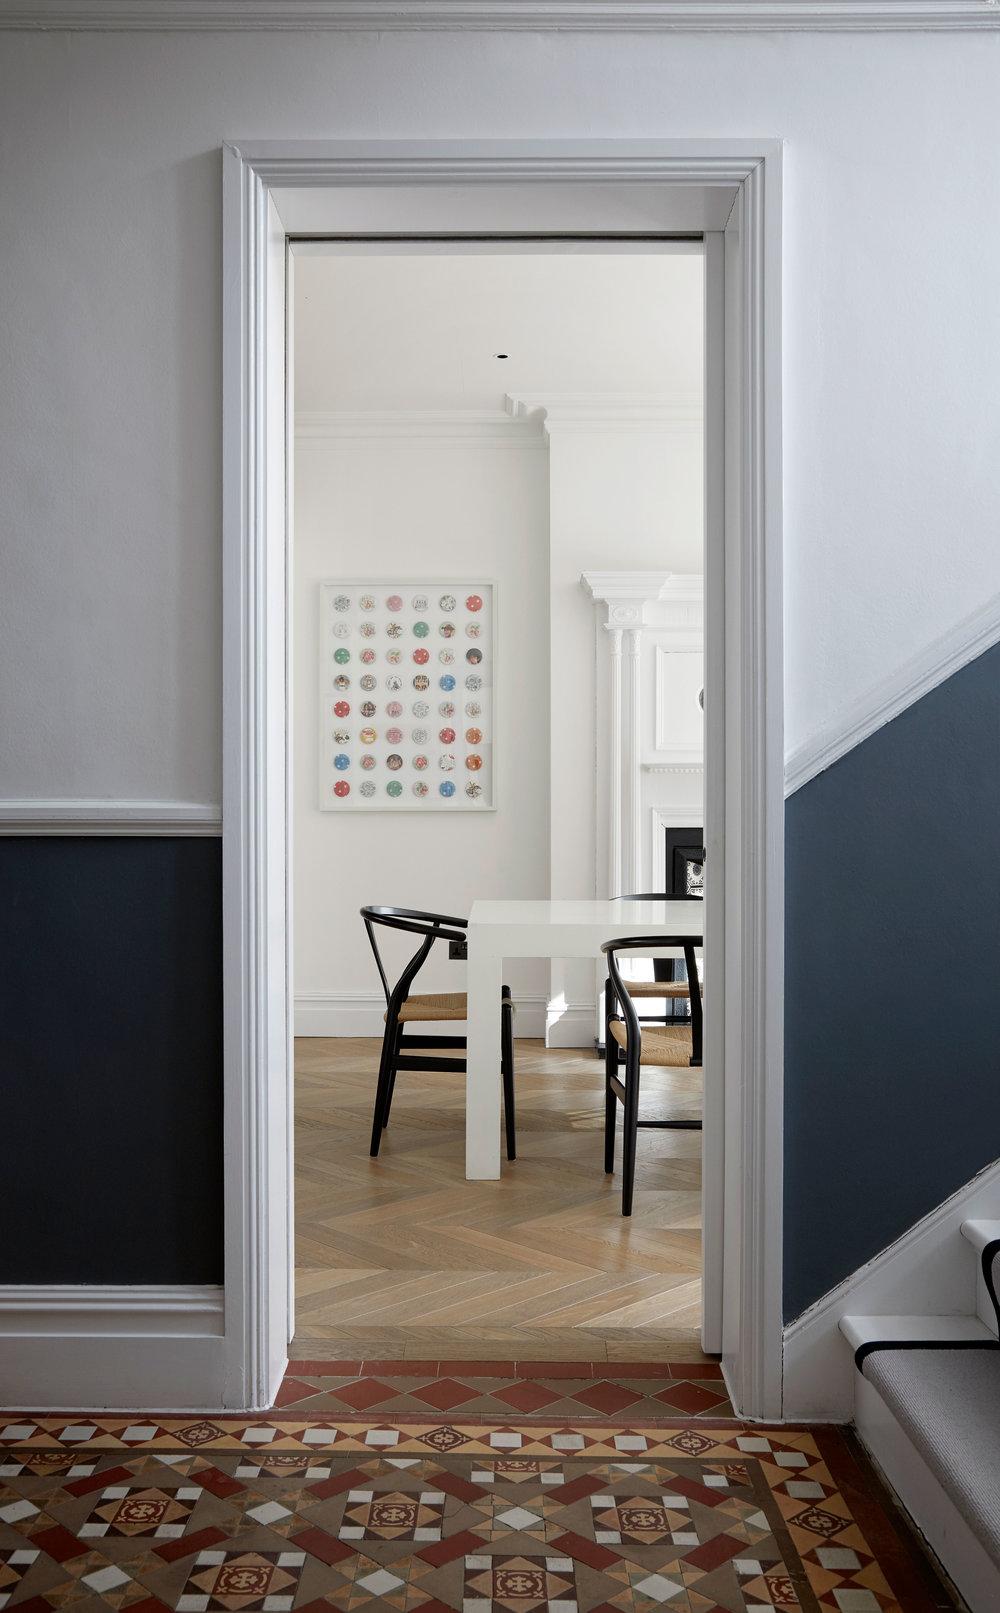 Internal-view-through-existing-house.jpg